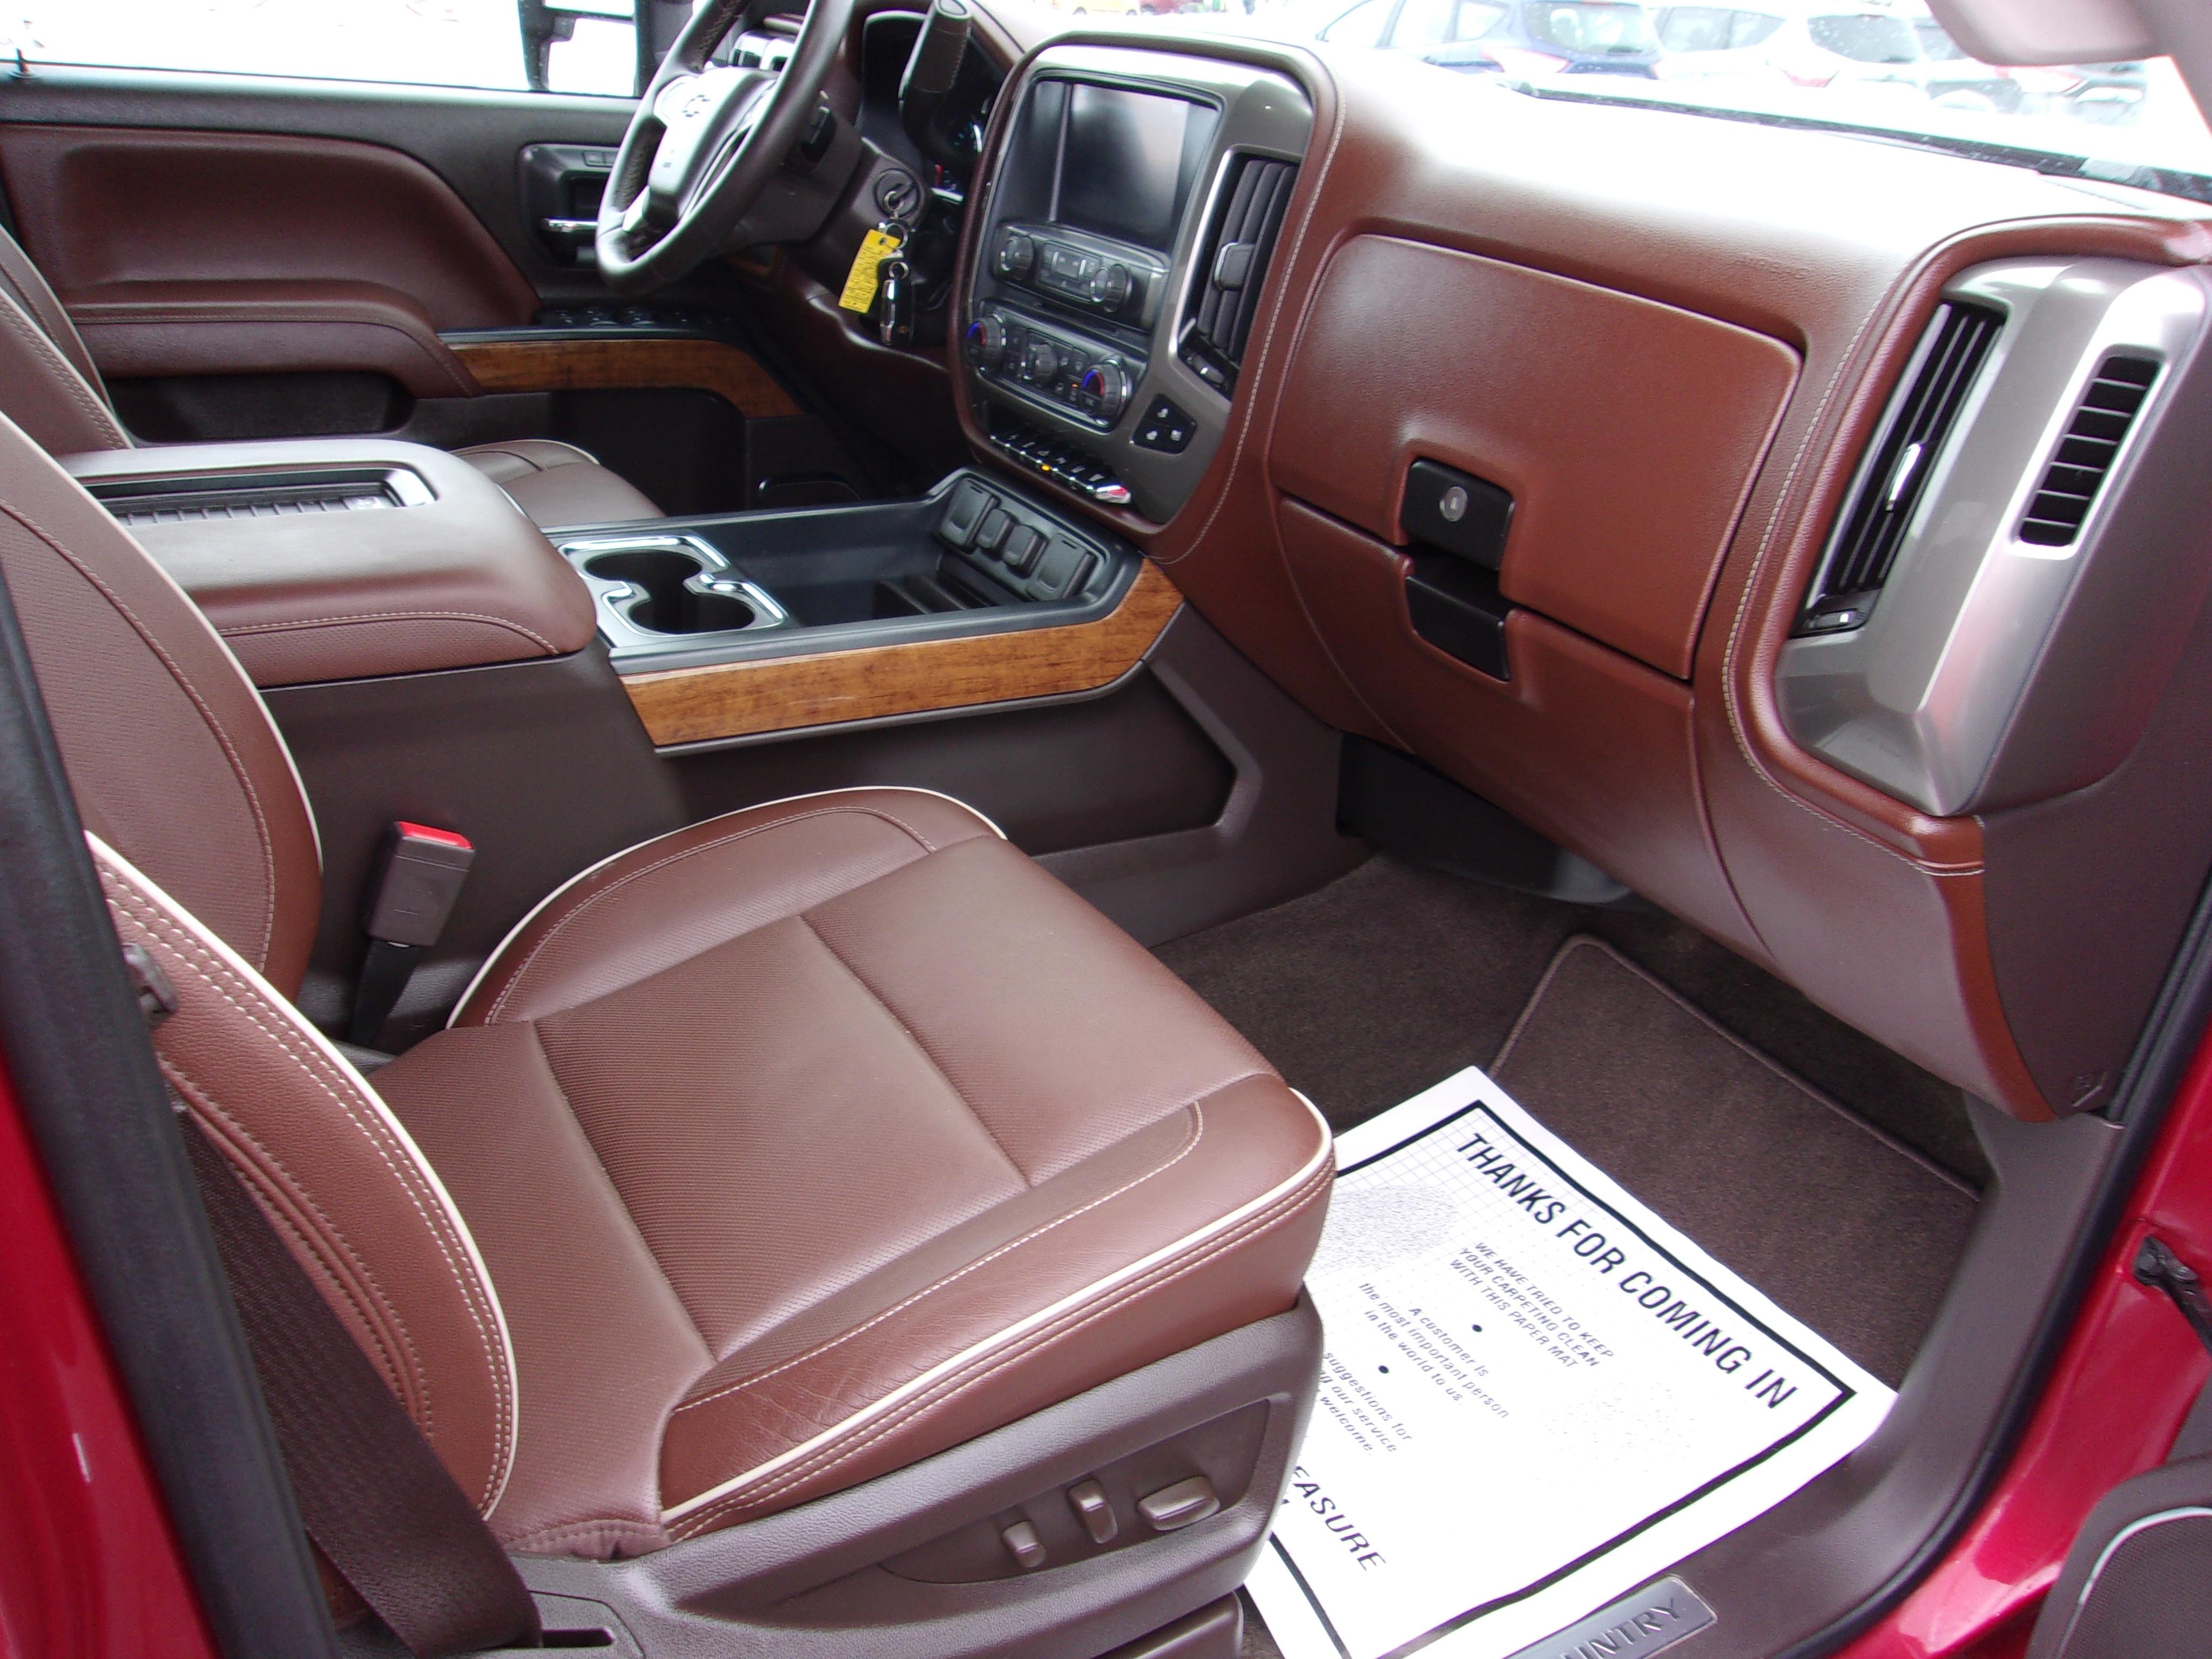 Used 2018 Chevrolet Silverado 2500HD For Sale at Carson Ford